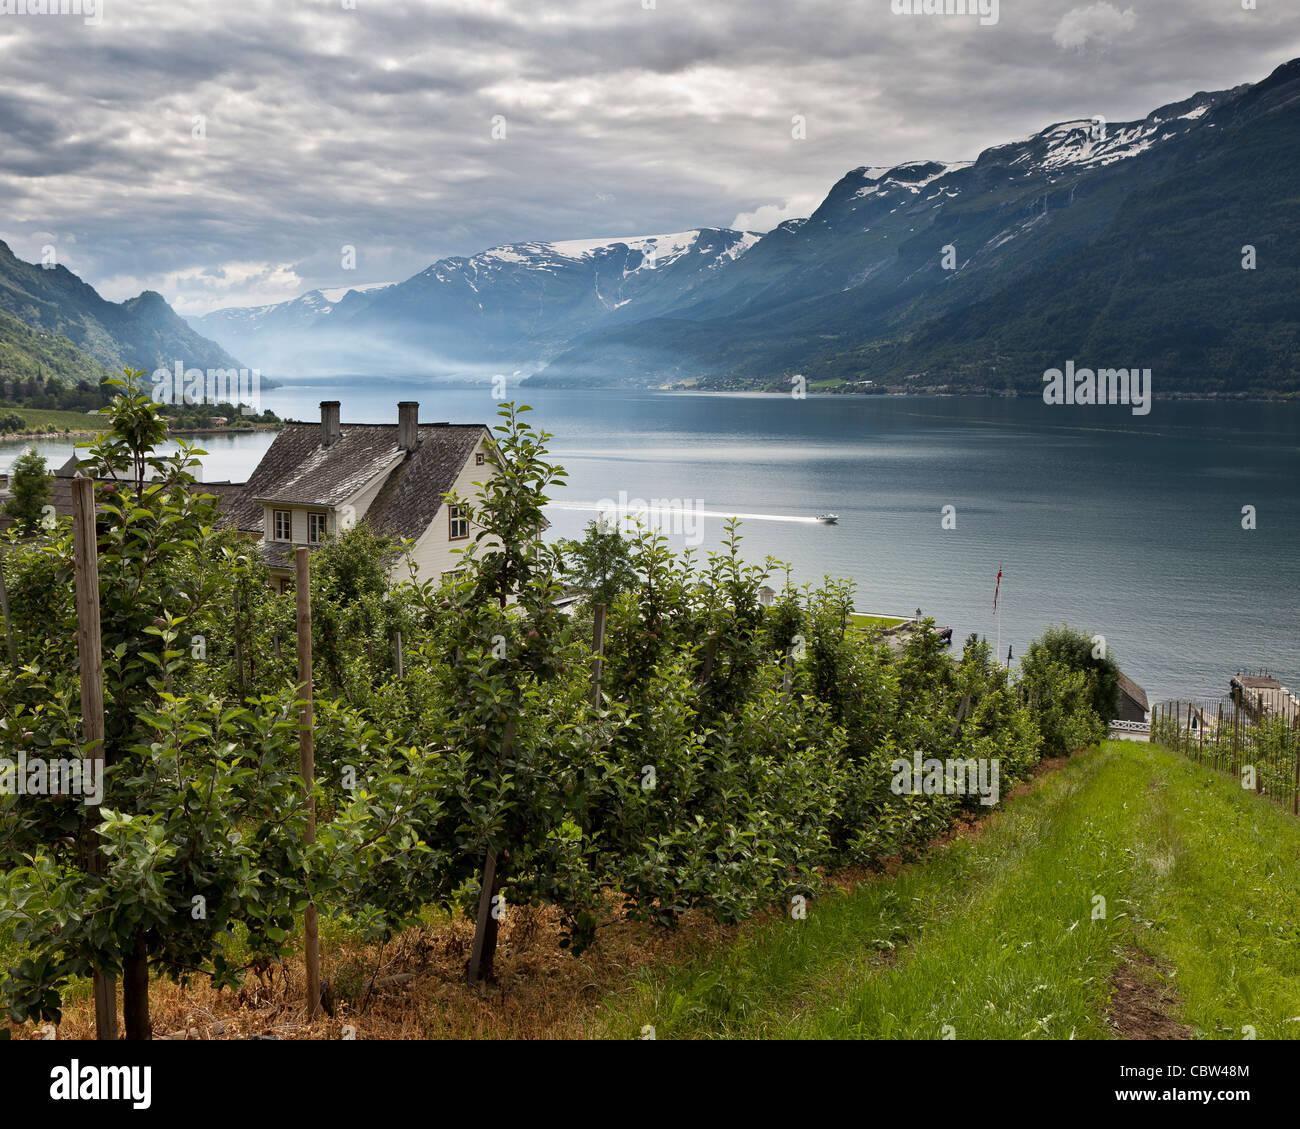 Apple Orchard, Lofthus, Ullensvang, Norway - Stock Image